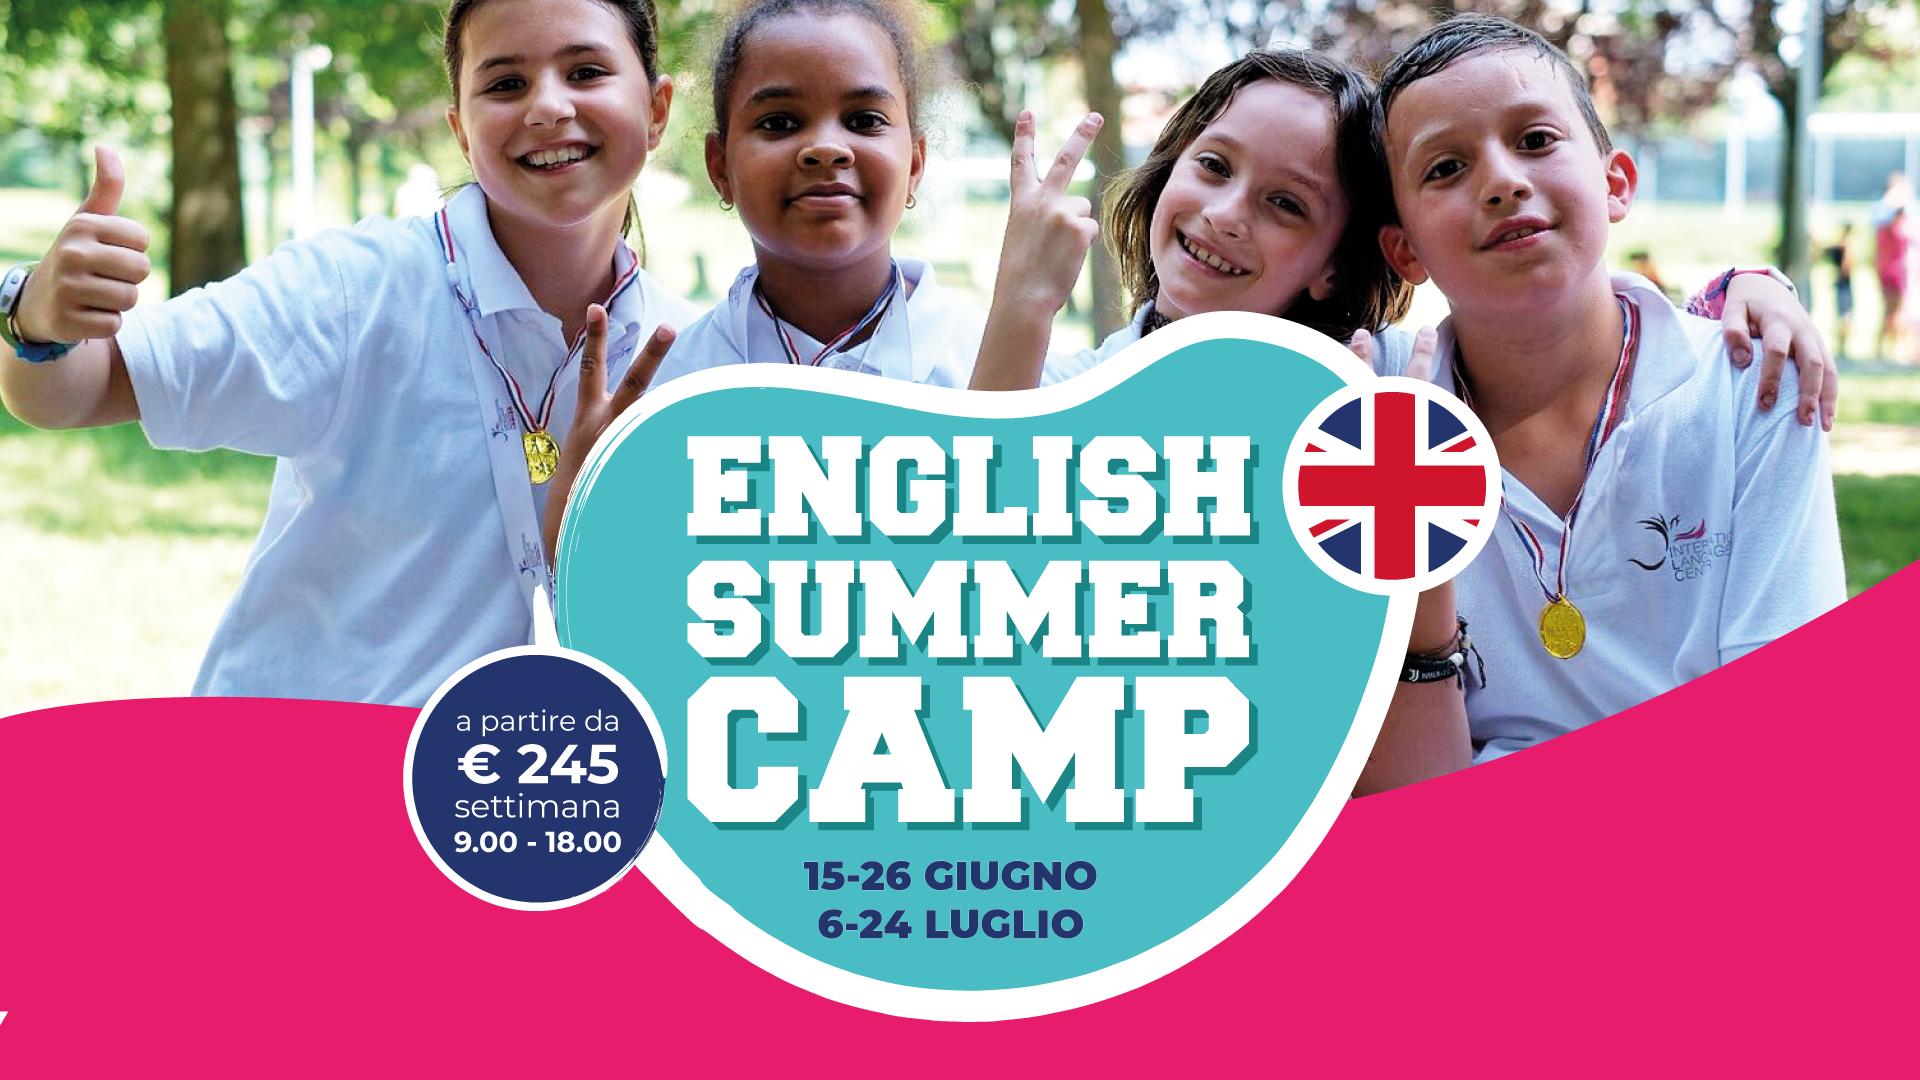 English Summer Camp - International Language Center - Scuola di ...